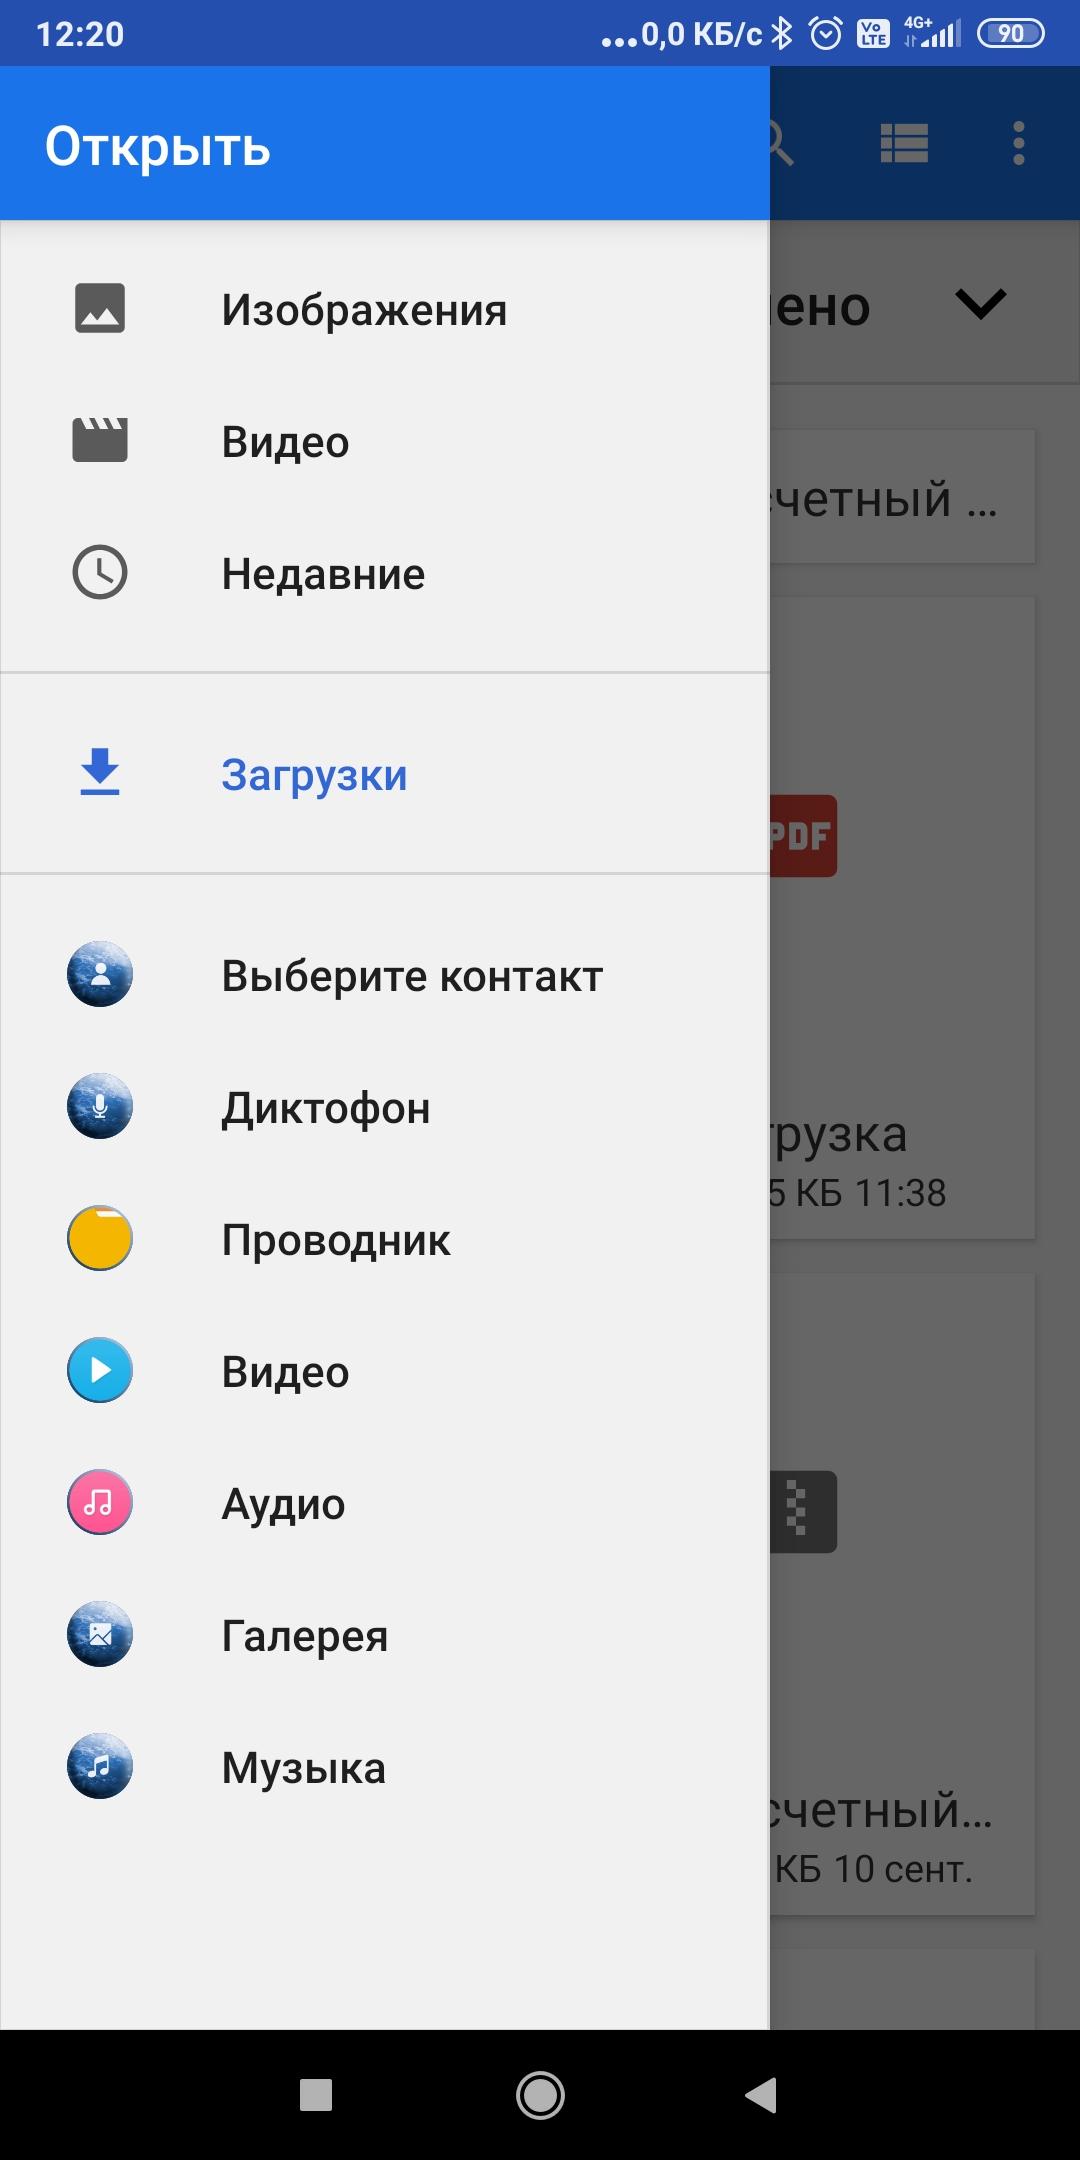 Screenshot_2021-09-16-12-20-37-709_com.android.documentsui.jpg